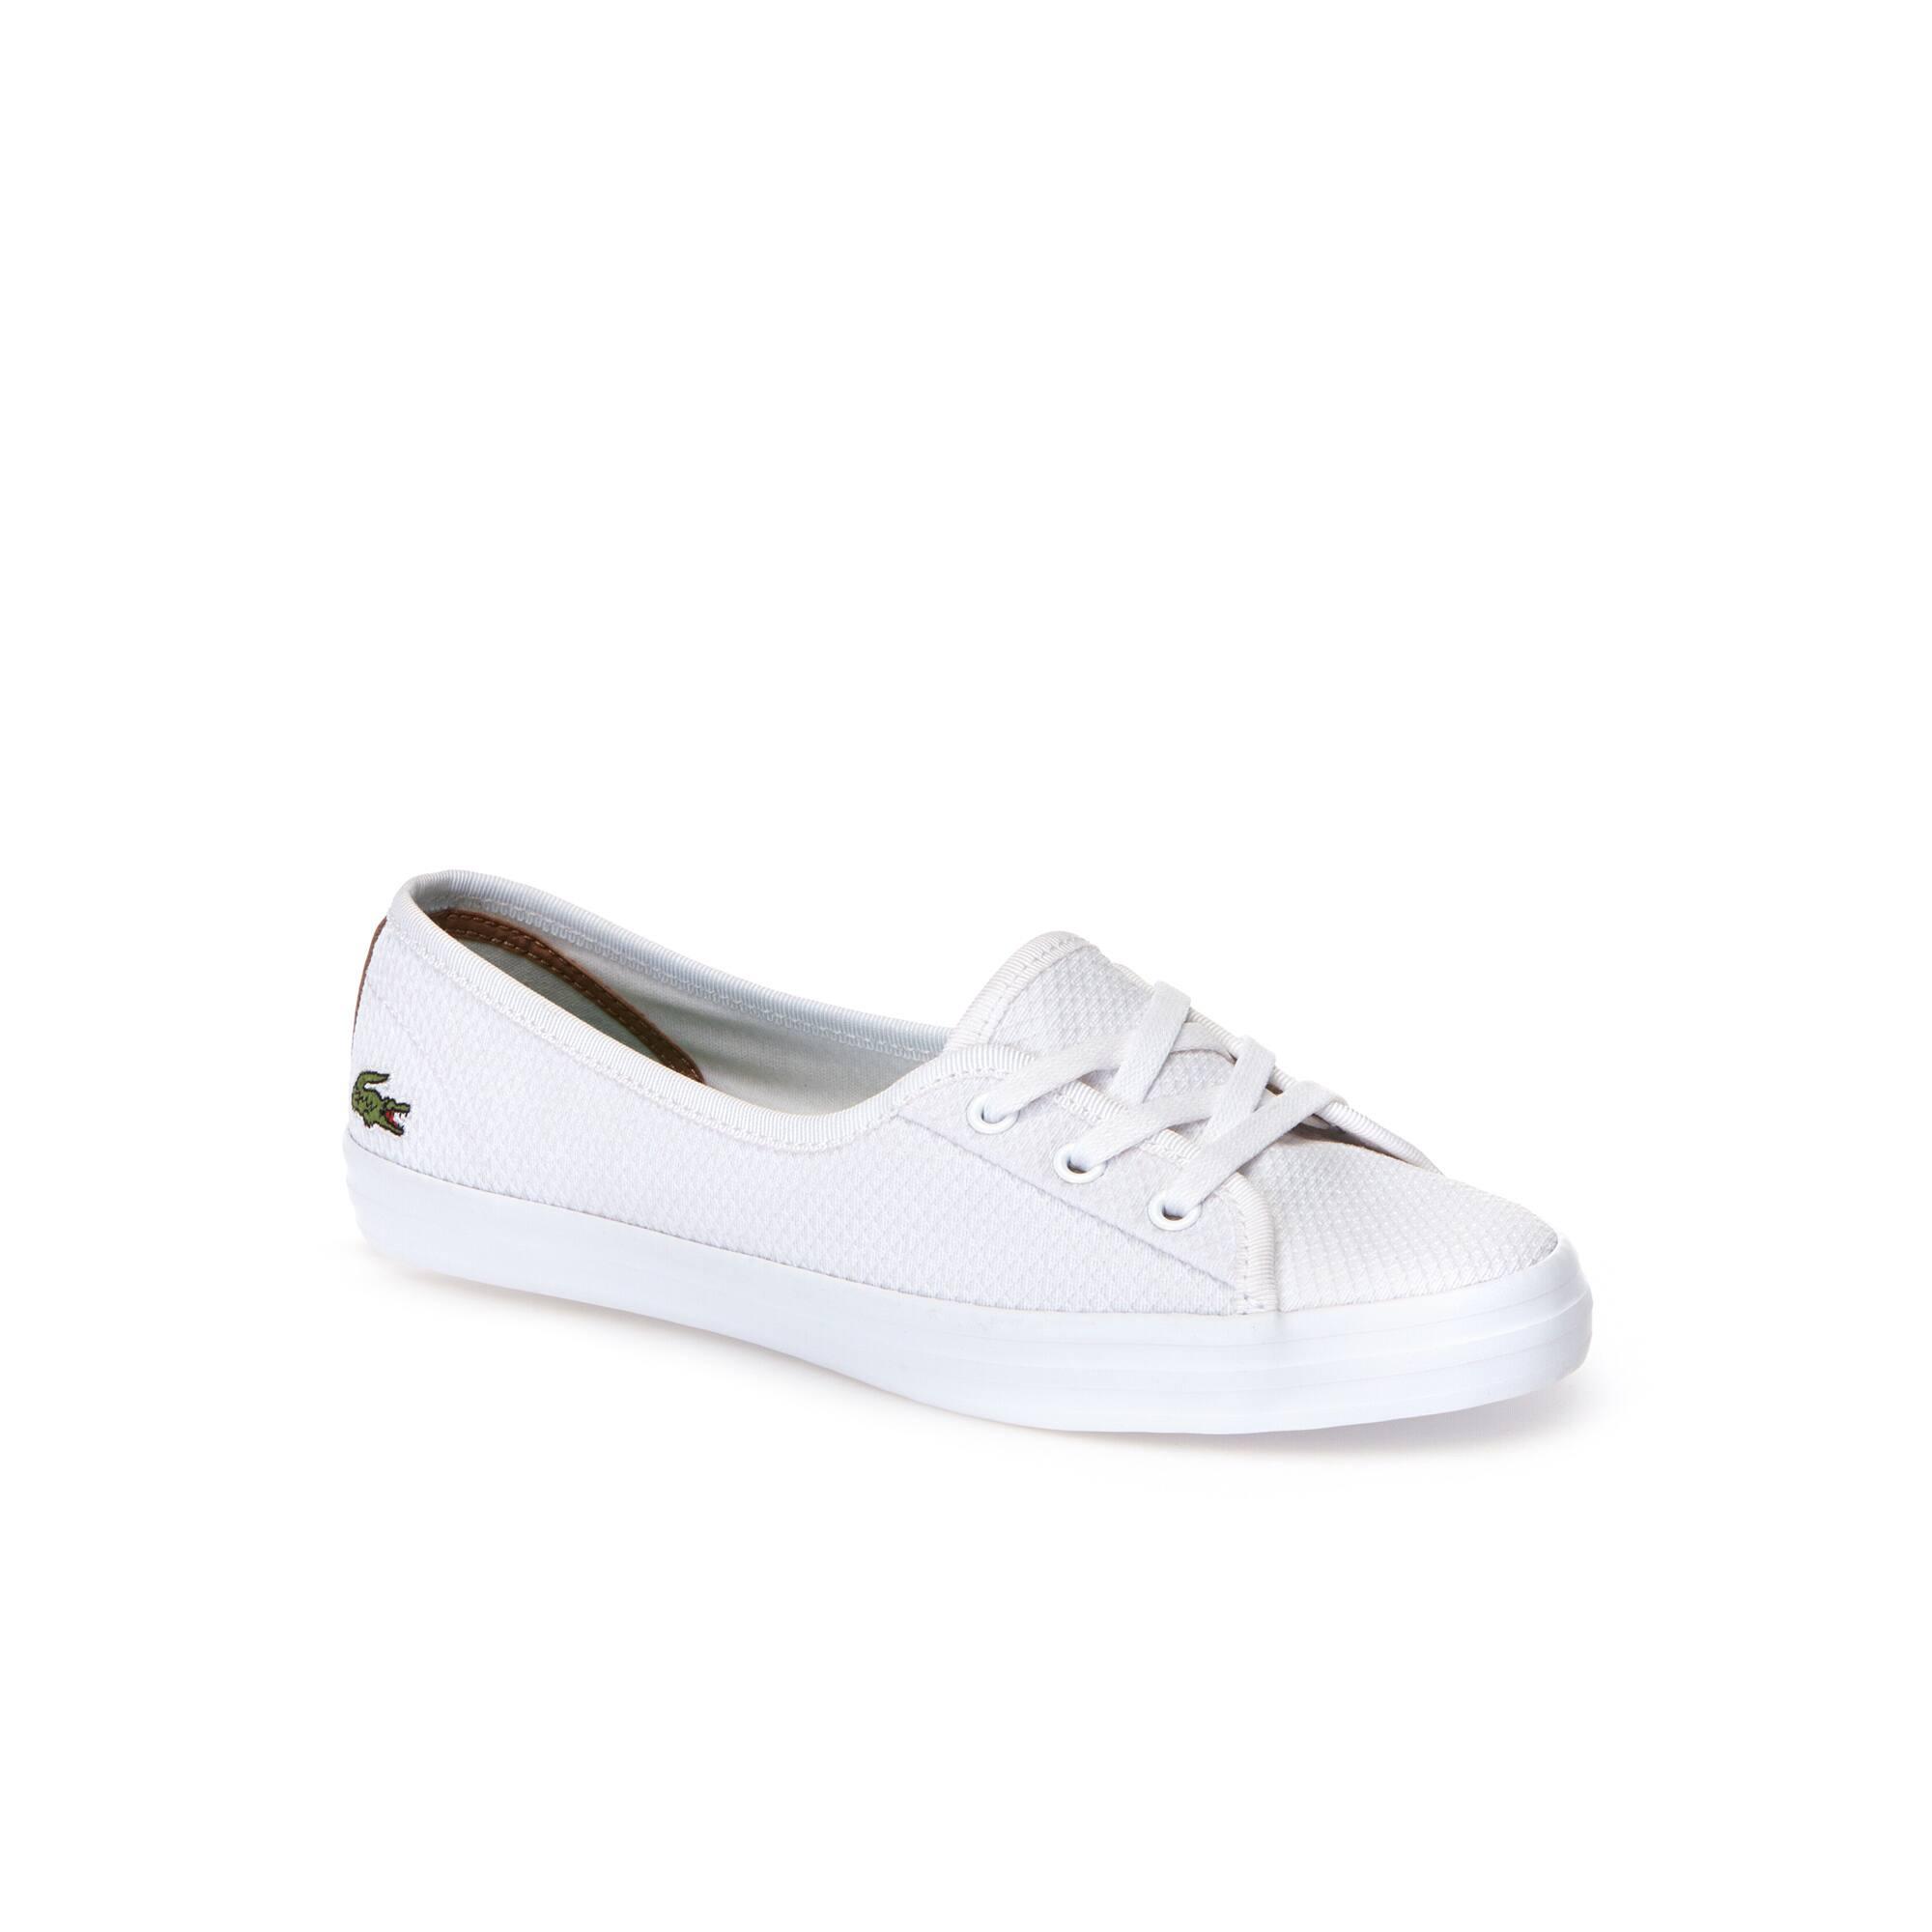 Damen-Sneakers ZIANE CHUNKY aus Canvas